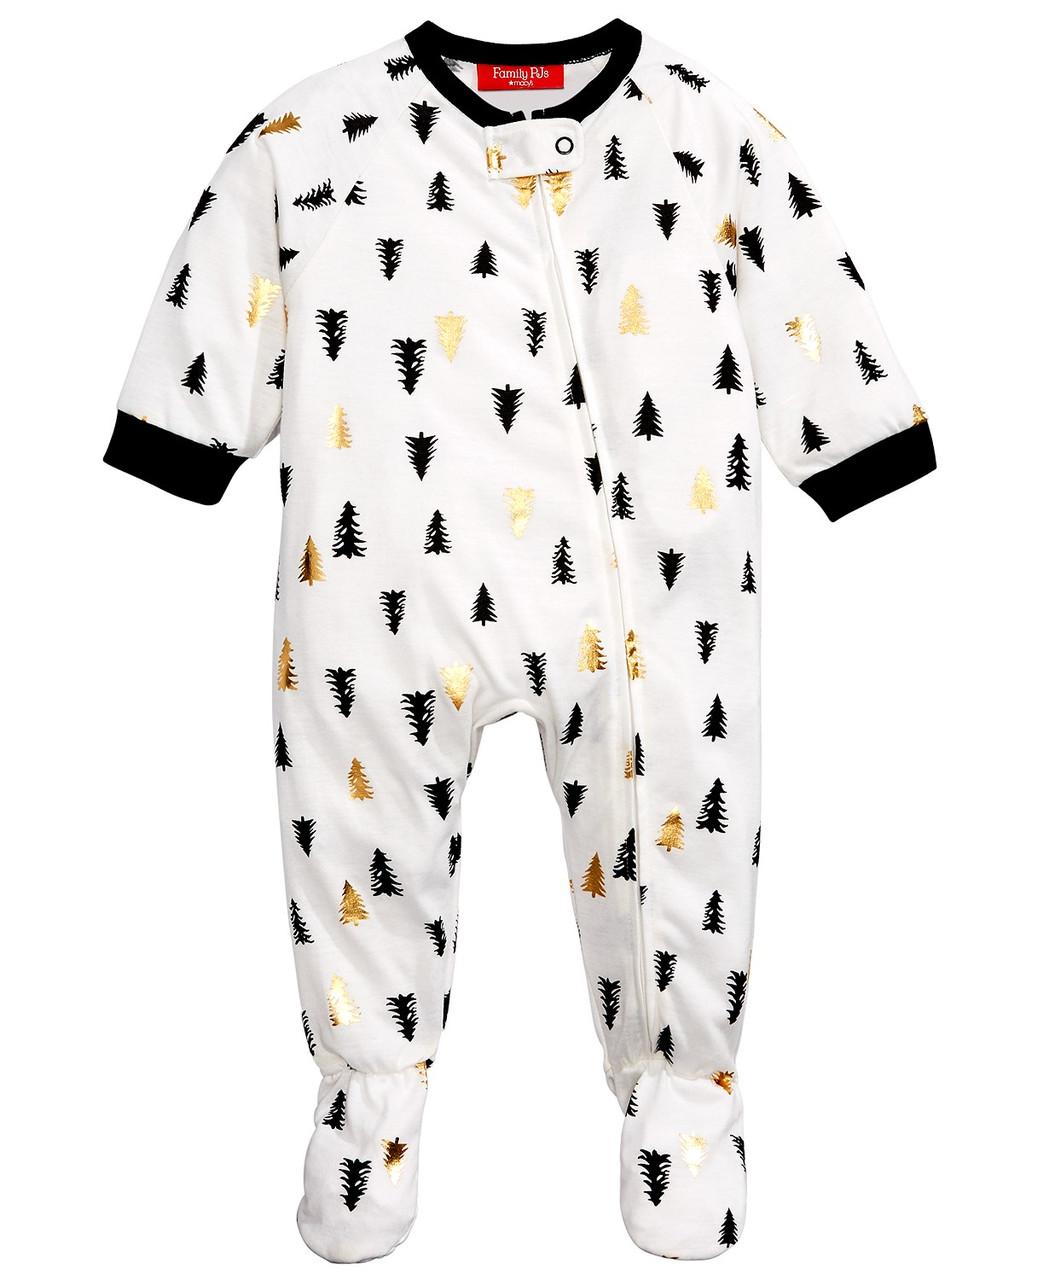 Family Pajamas Детский домашний комбинезон - Е2